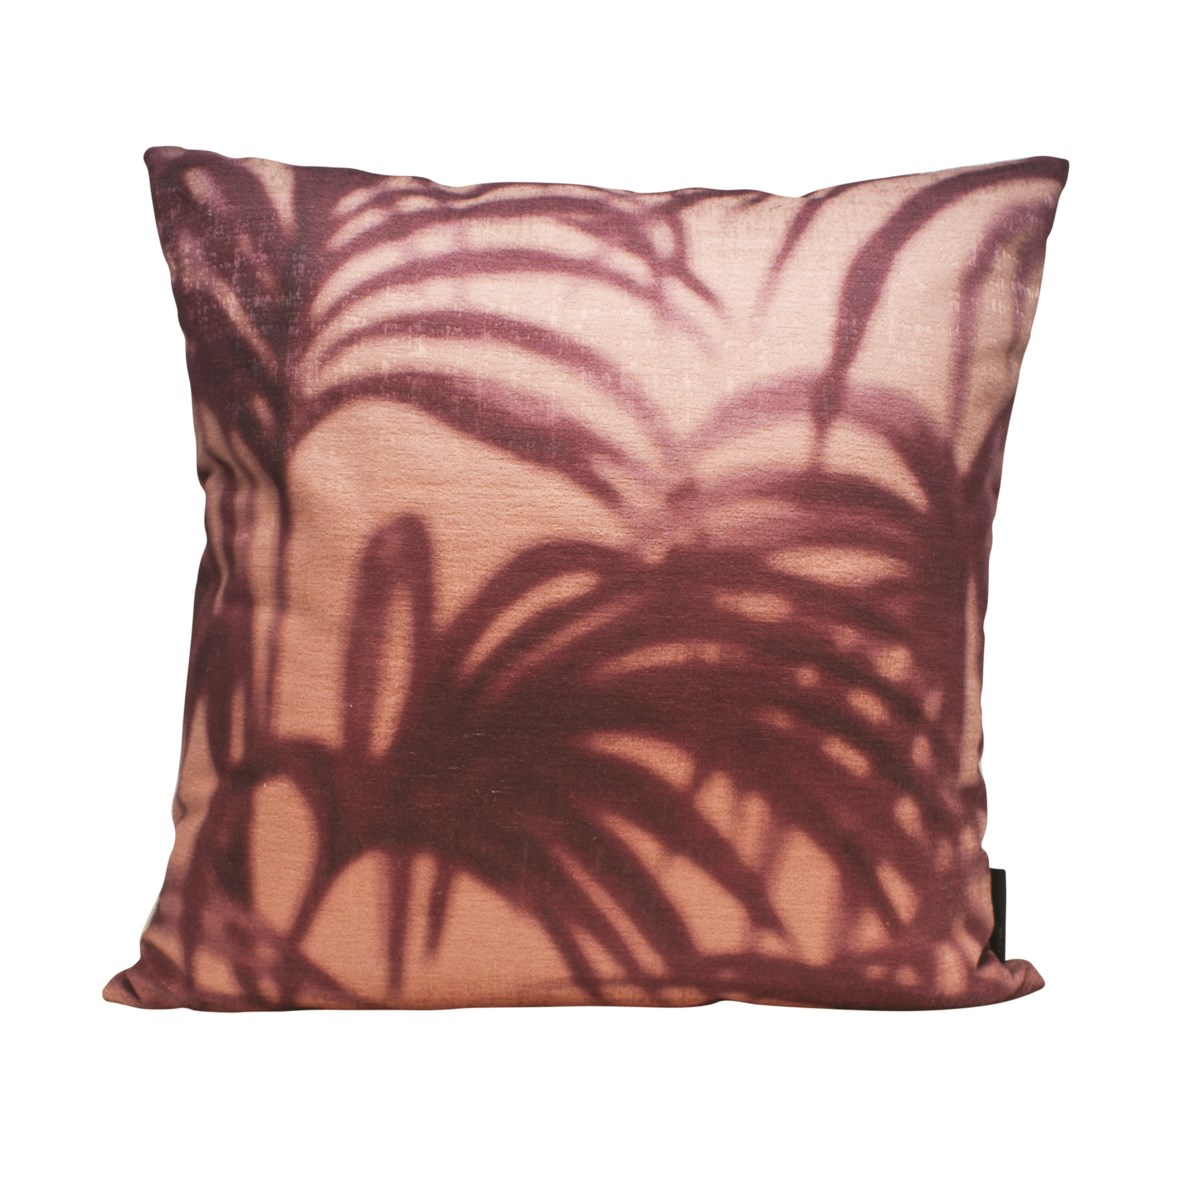 Cushion Verdana Filled